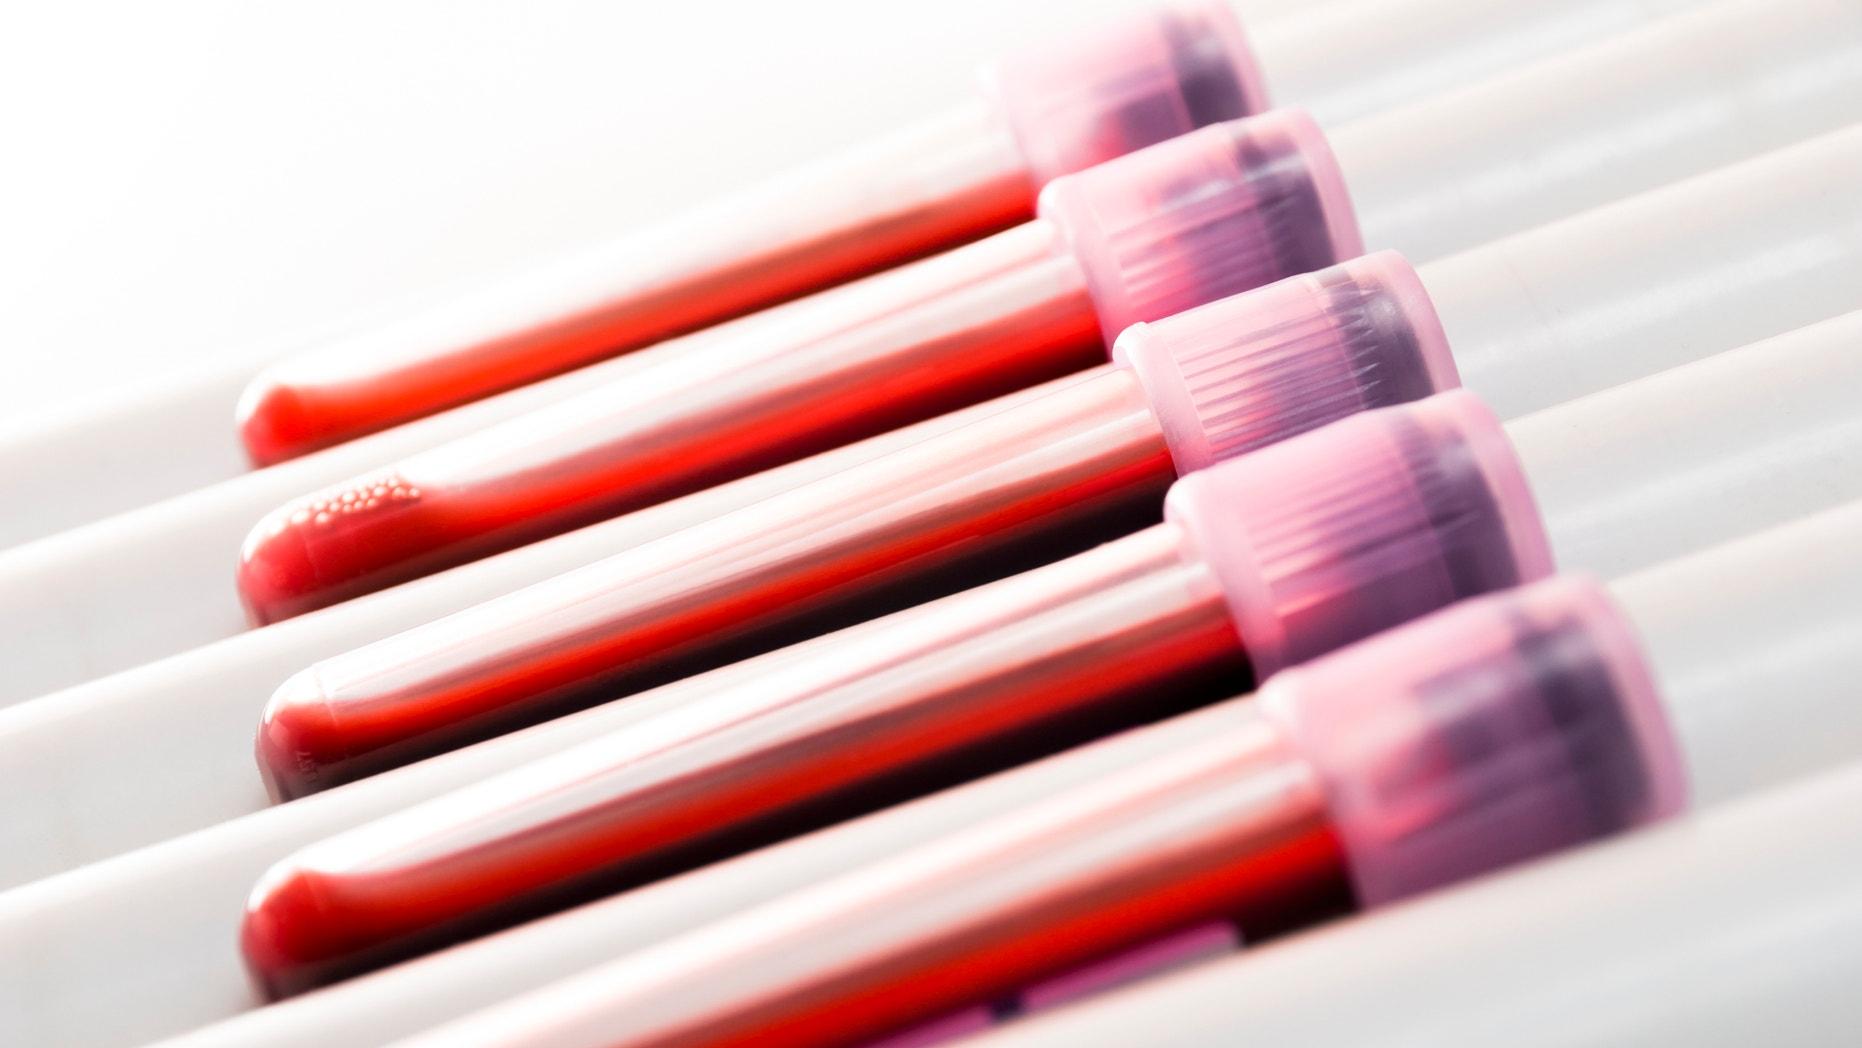 Blood samples in laboratory (coagulation test)